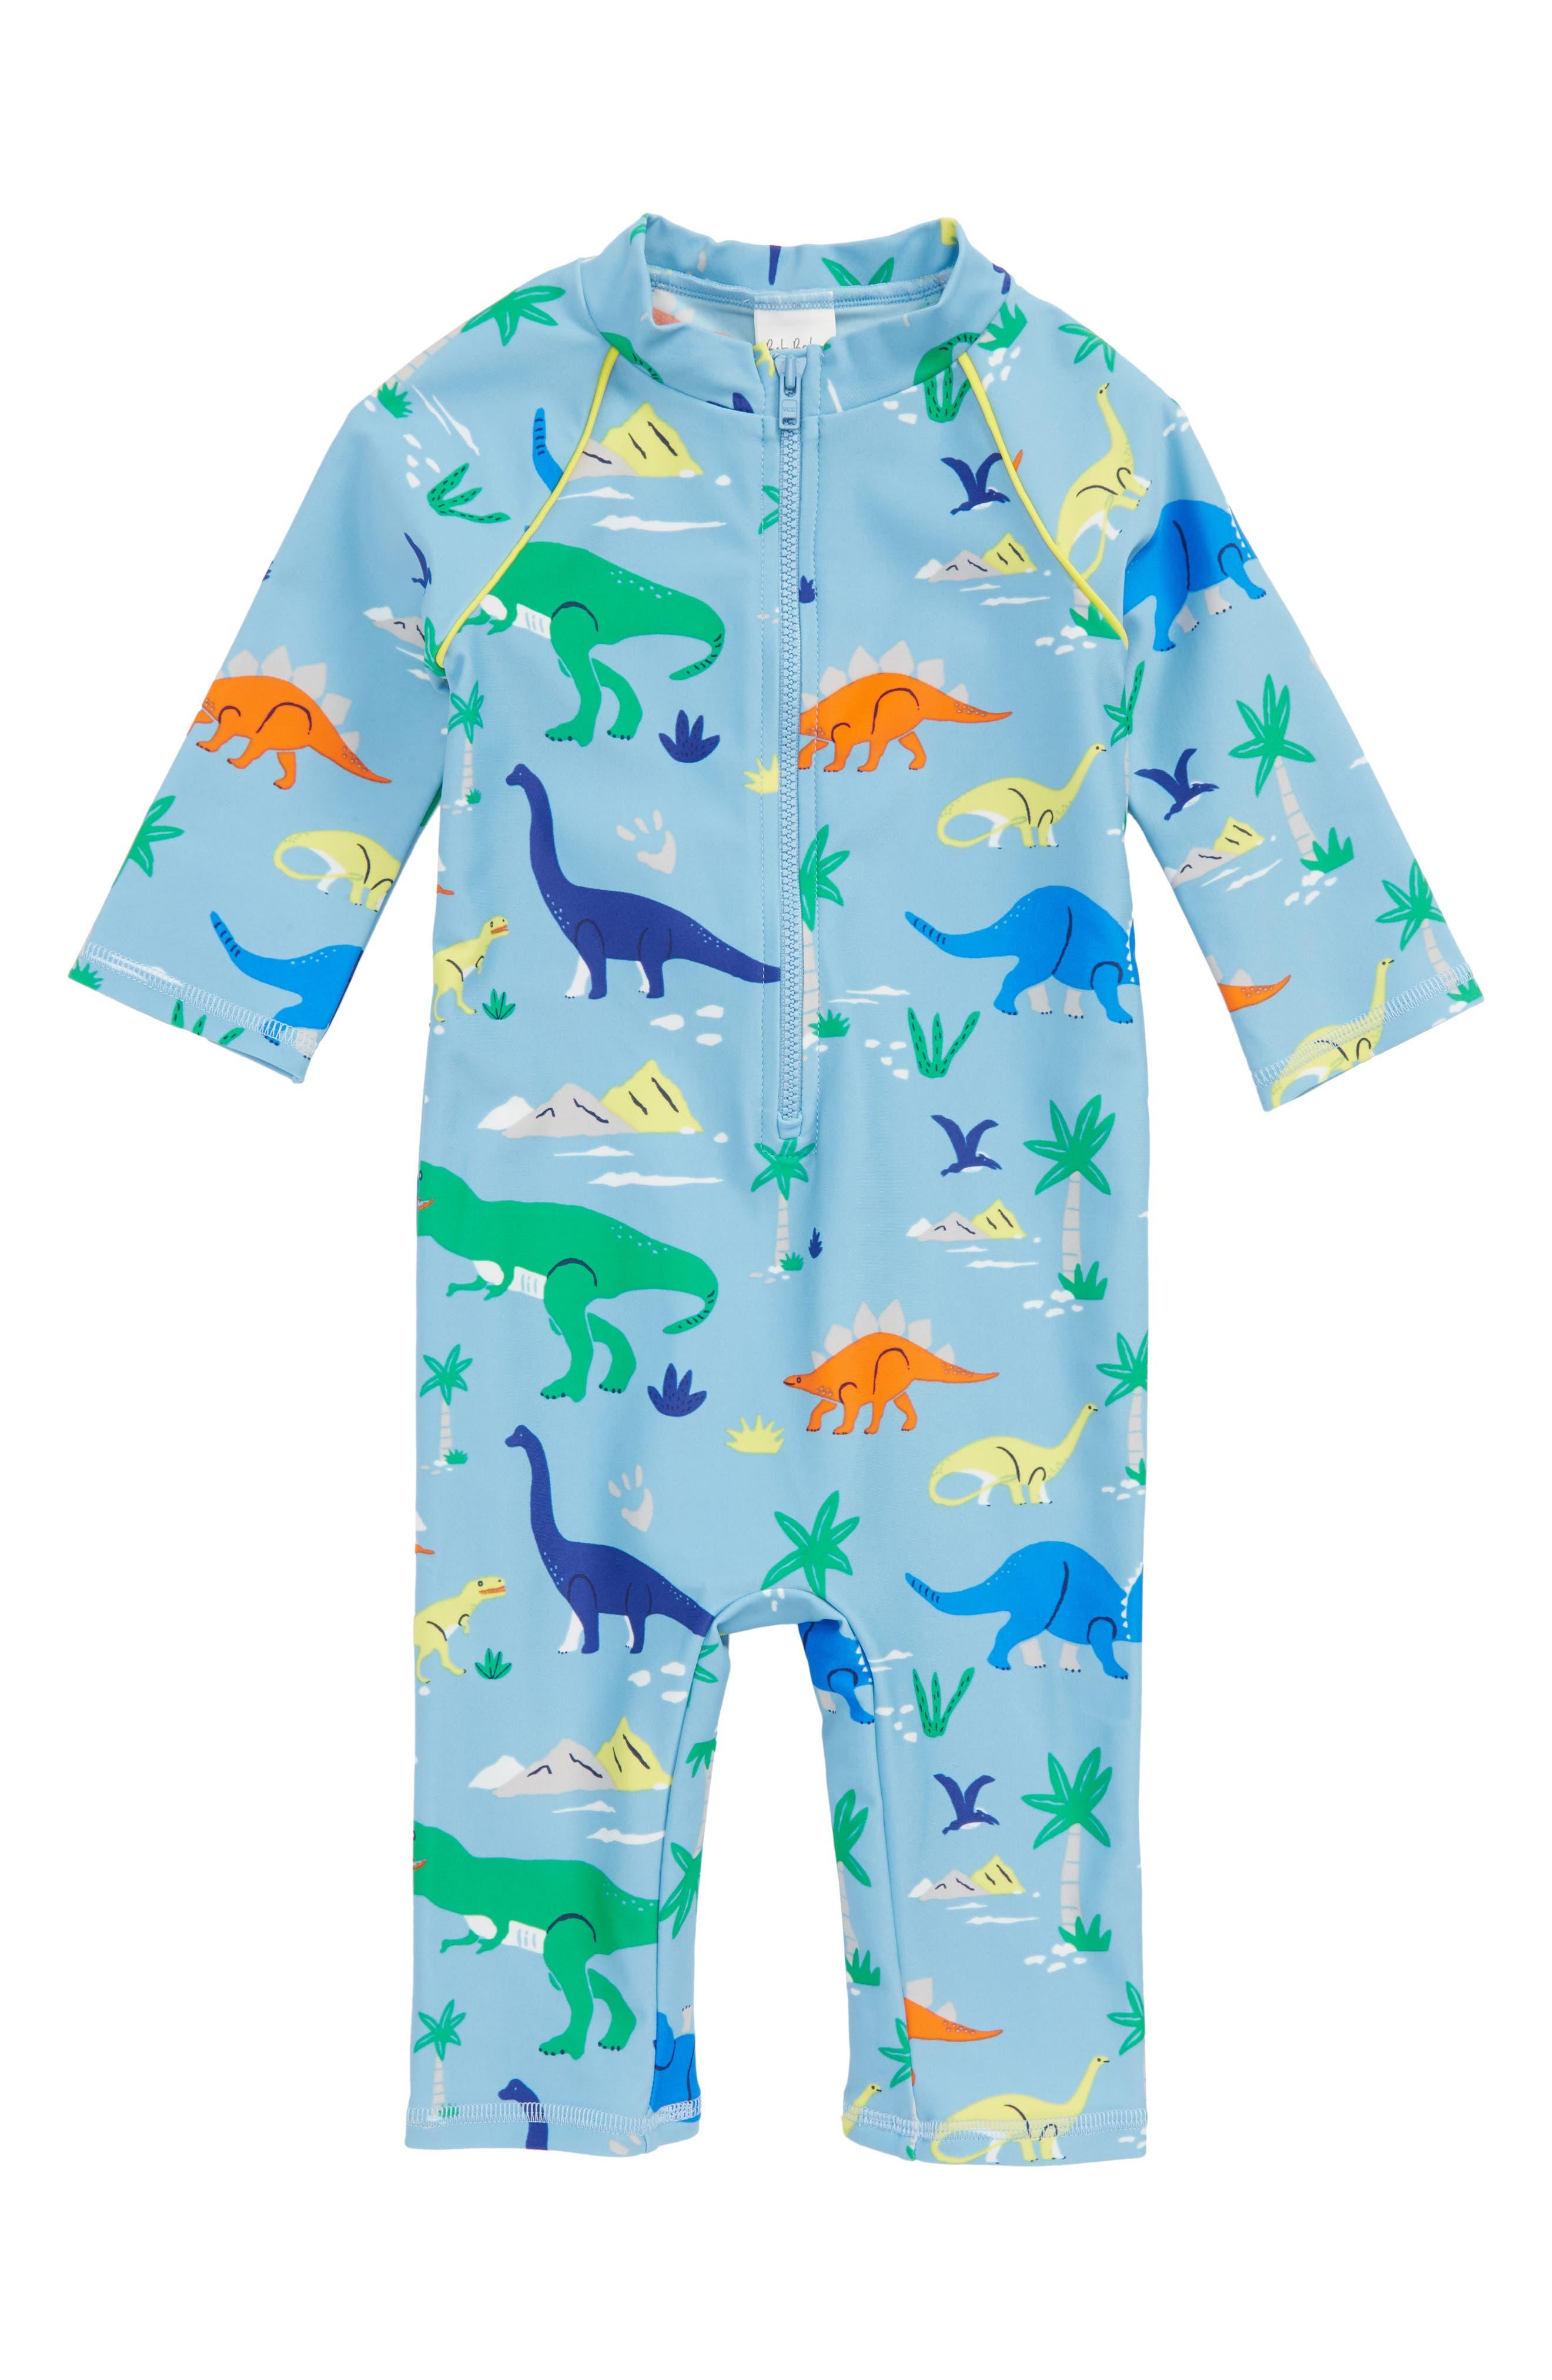 Animal Surf One-Piece Rashguard Swimsuit,                         Main,                         color, Grotto Blue